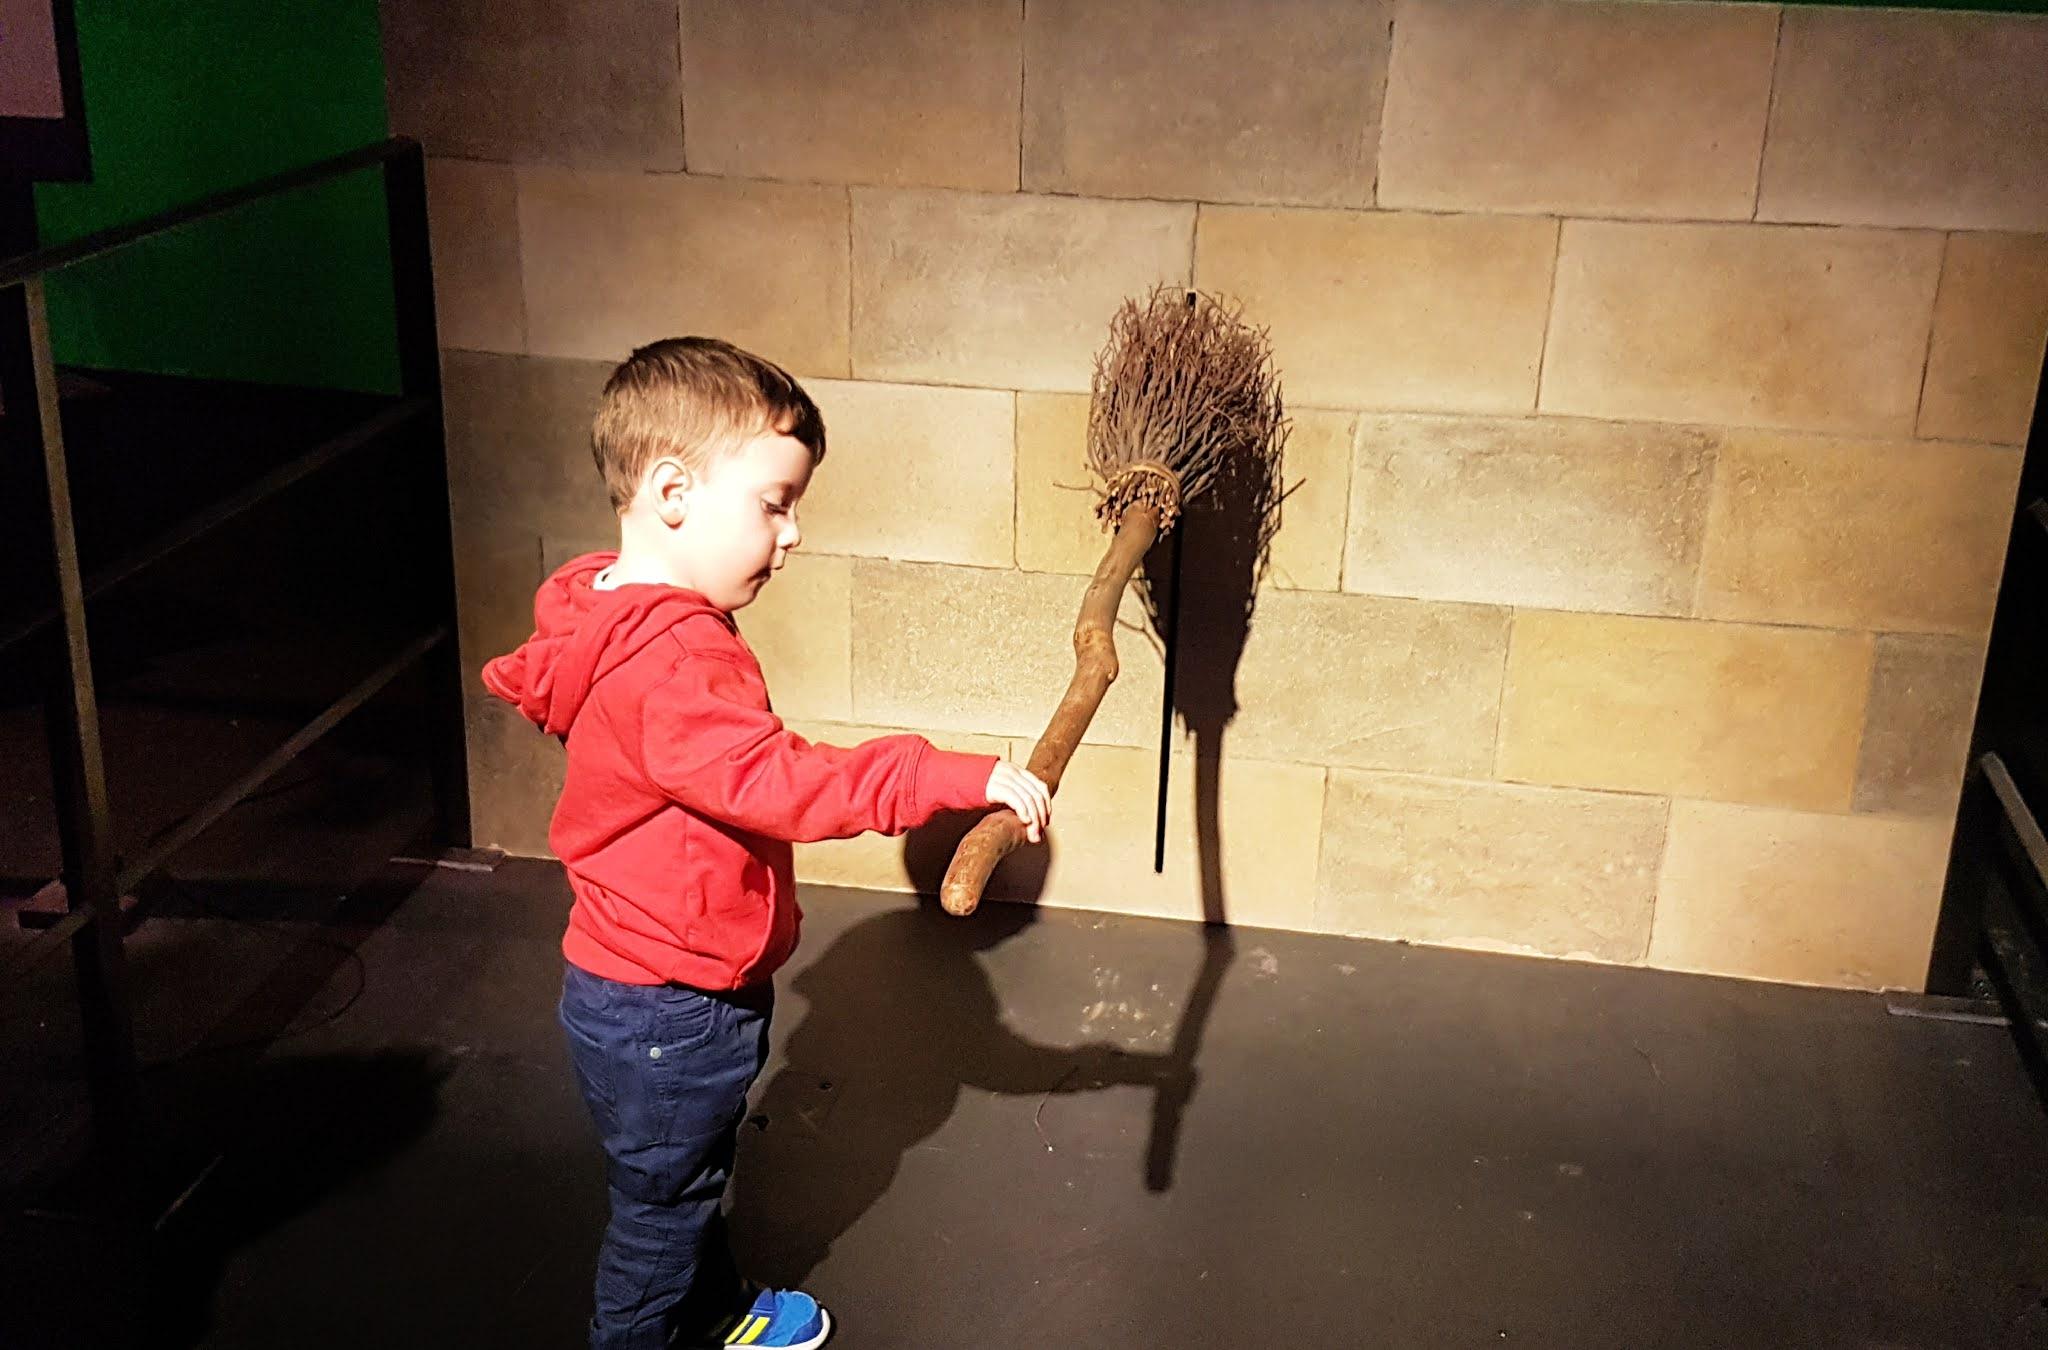 boy with wand